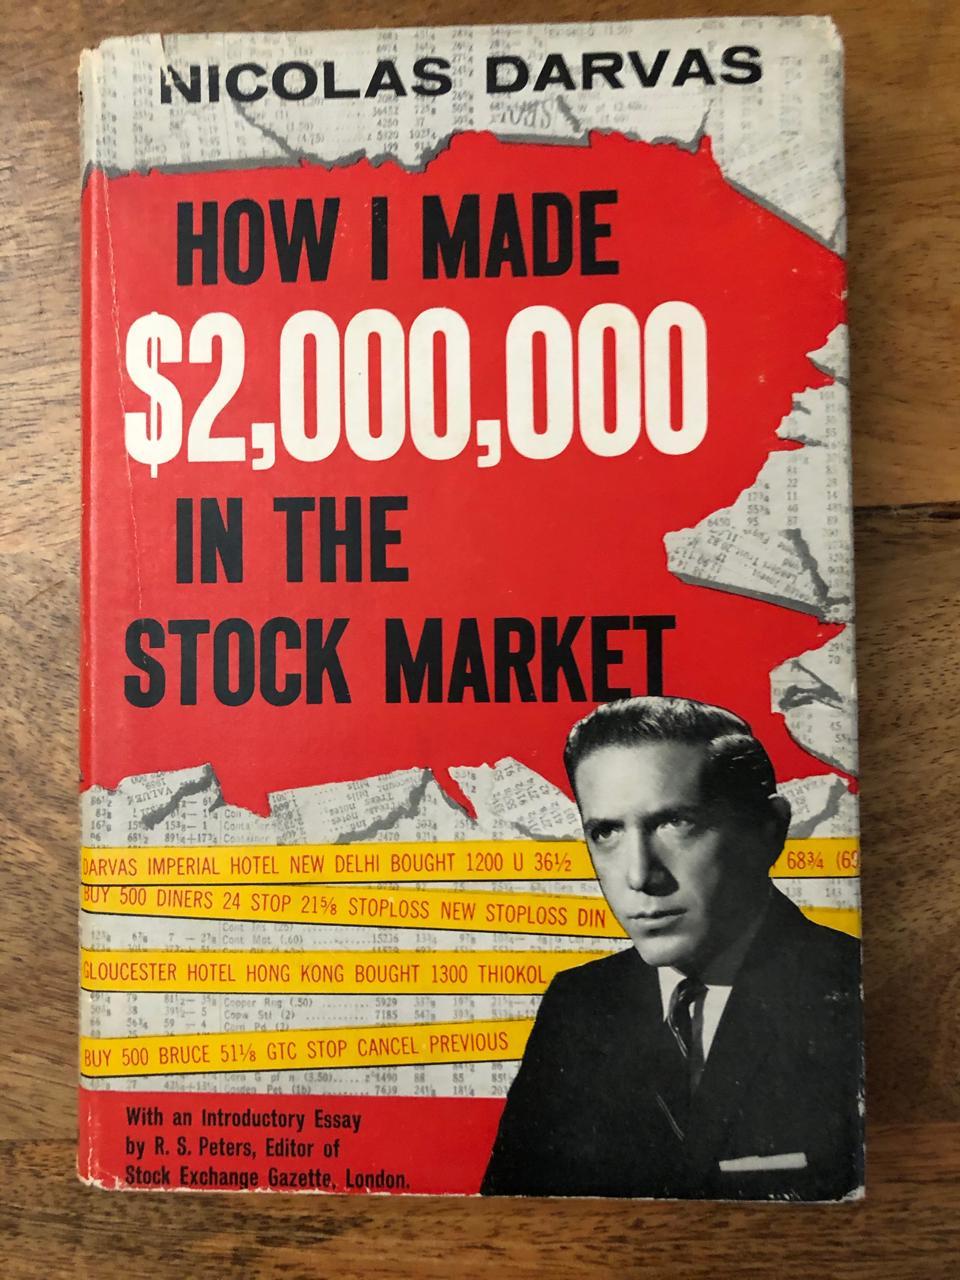 Book cover photo